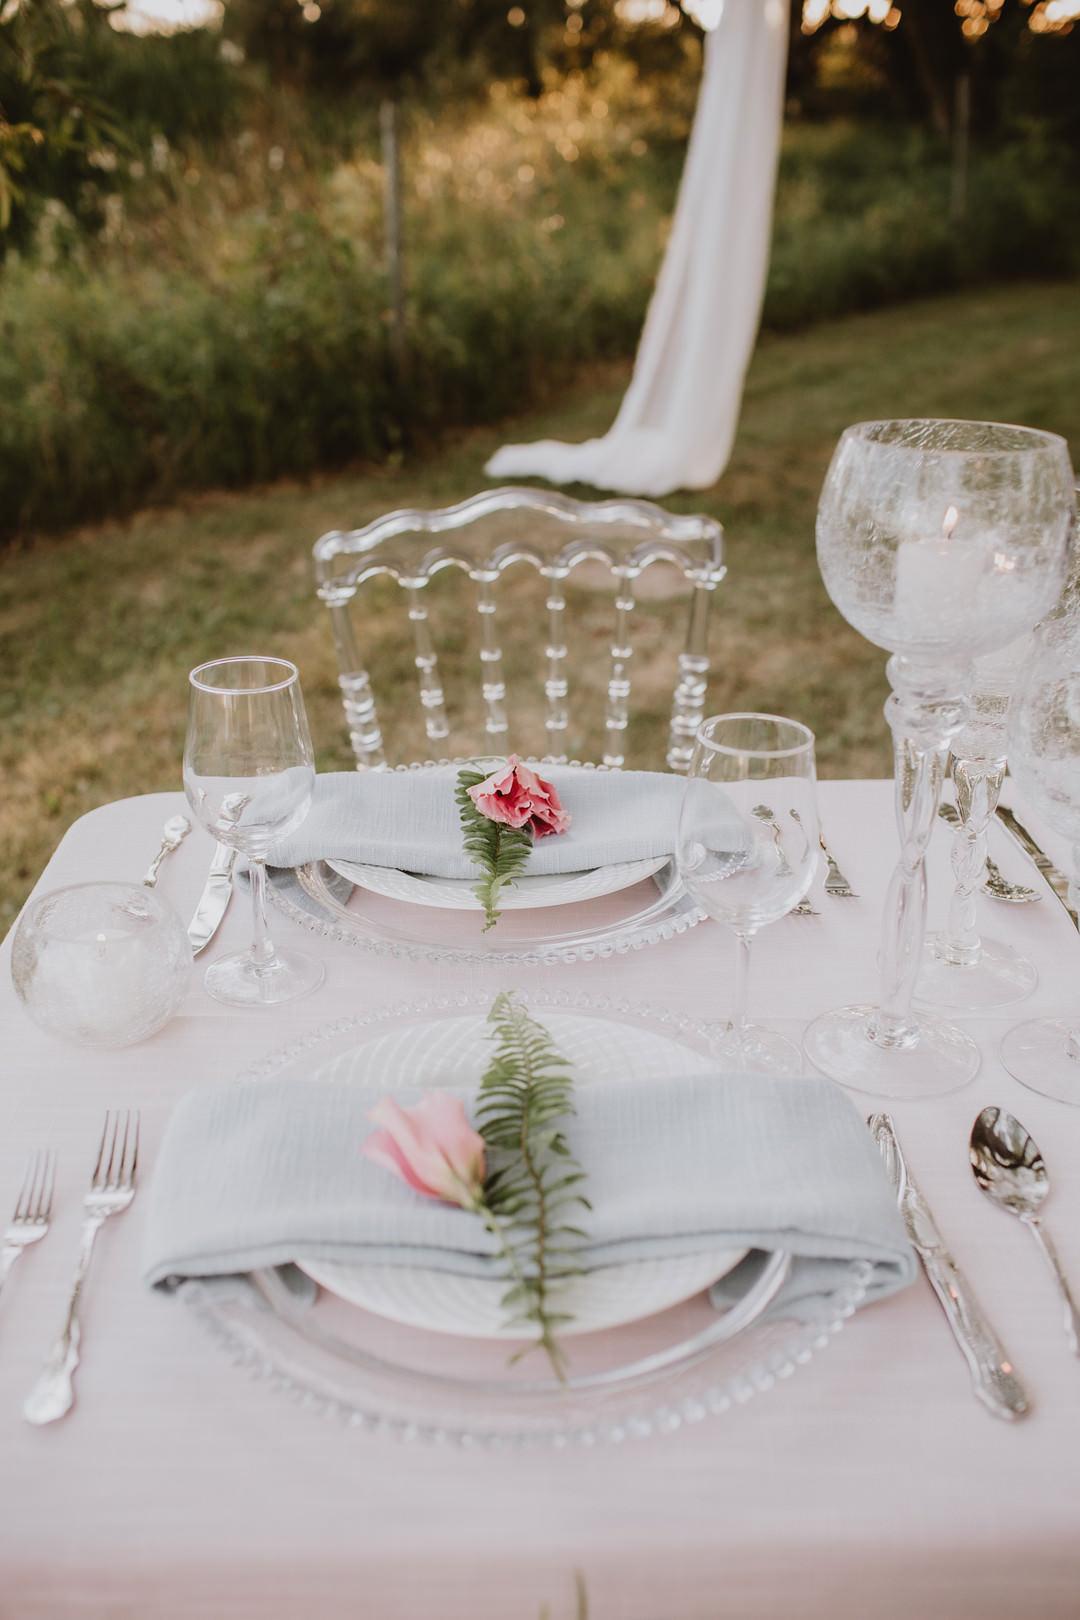 Place Setting Decor Pink Rose Fairytale Forest Wedding Christina W Kroeker Creative